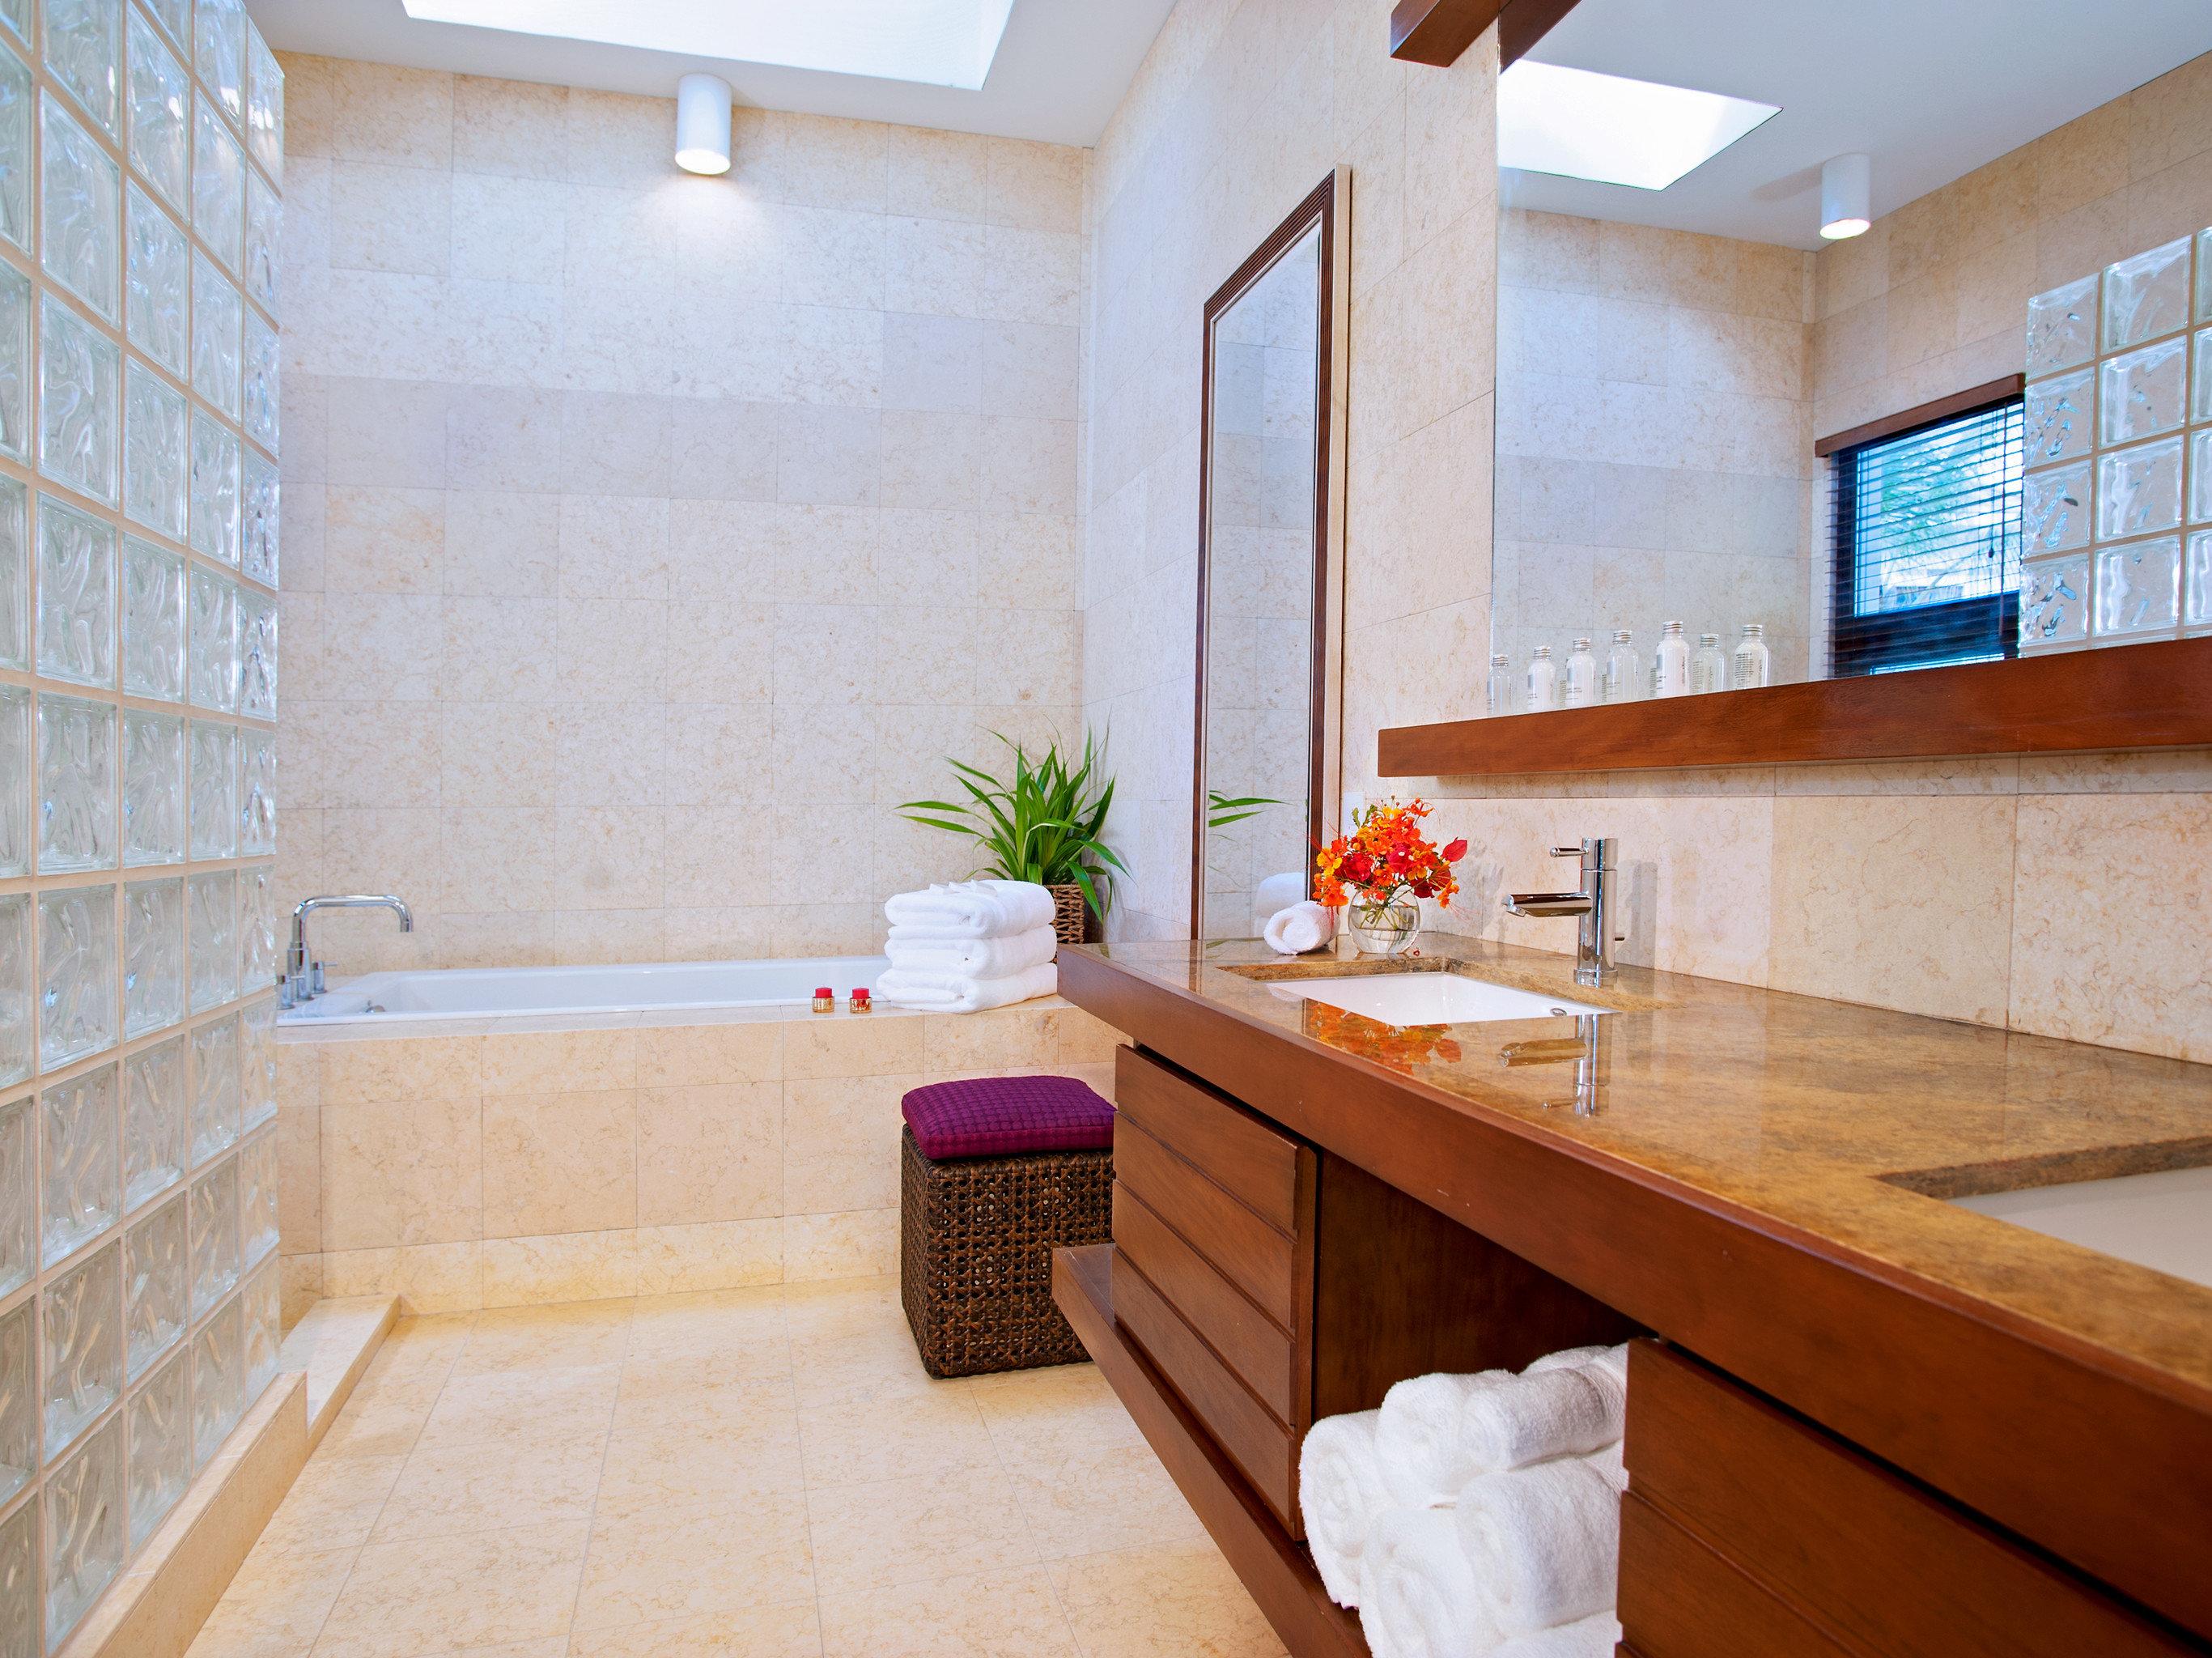 Bath Classic Eco Island property bathroom hardwood home counter cottage sink flooring countertop wood flooring tub tile bathtub tiled